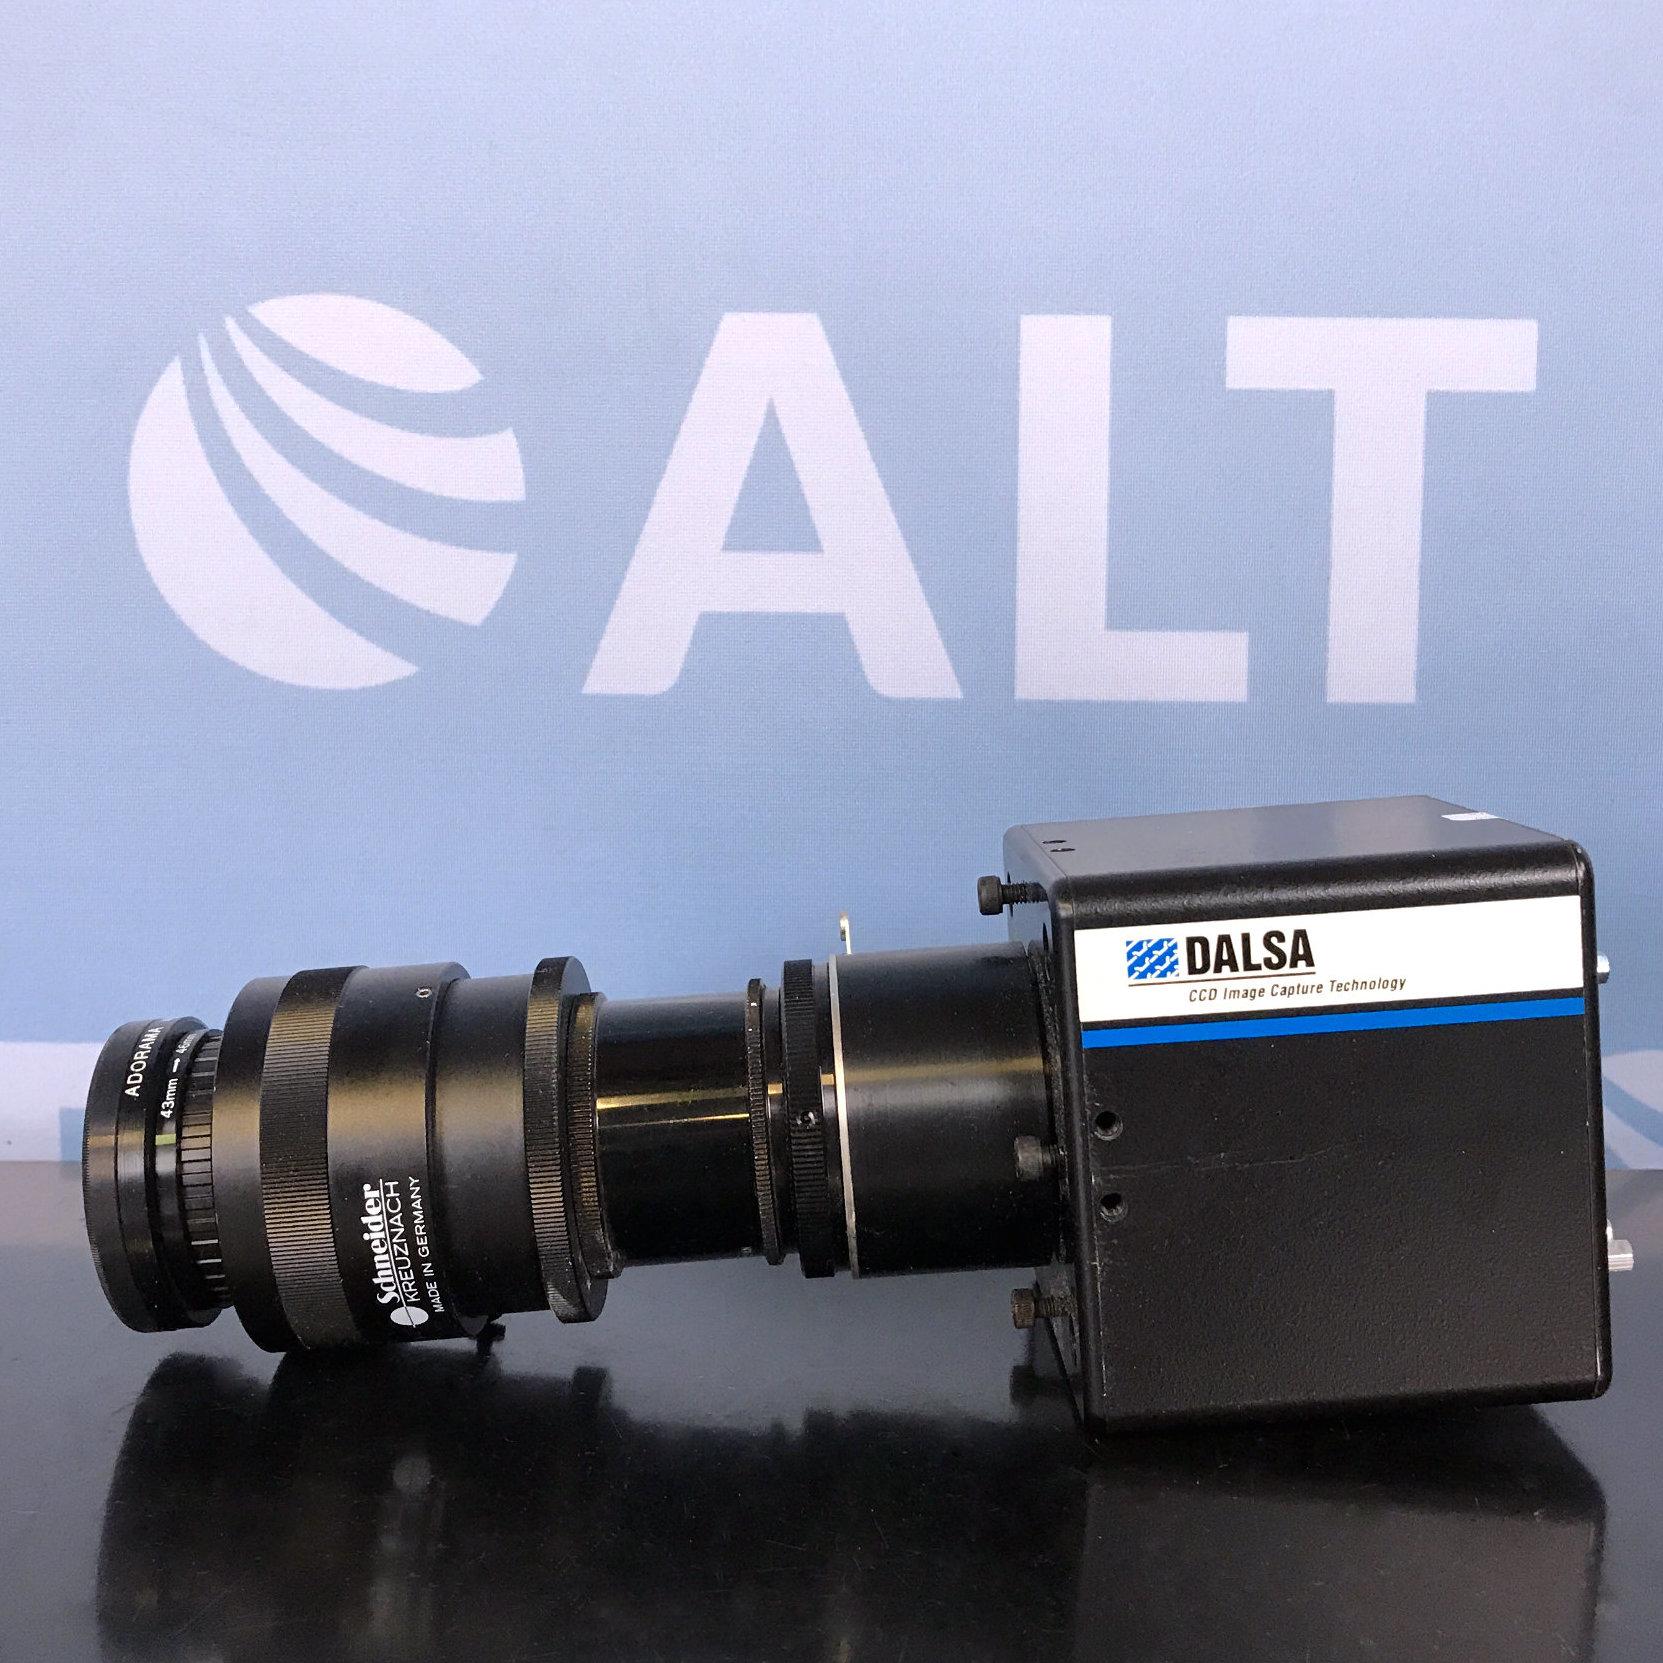 Dalsa Digital CCD Line Scan Camera Image